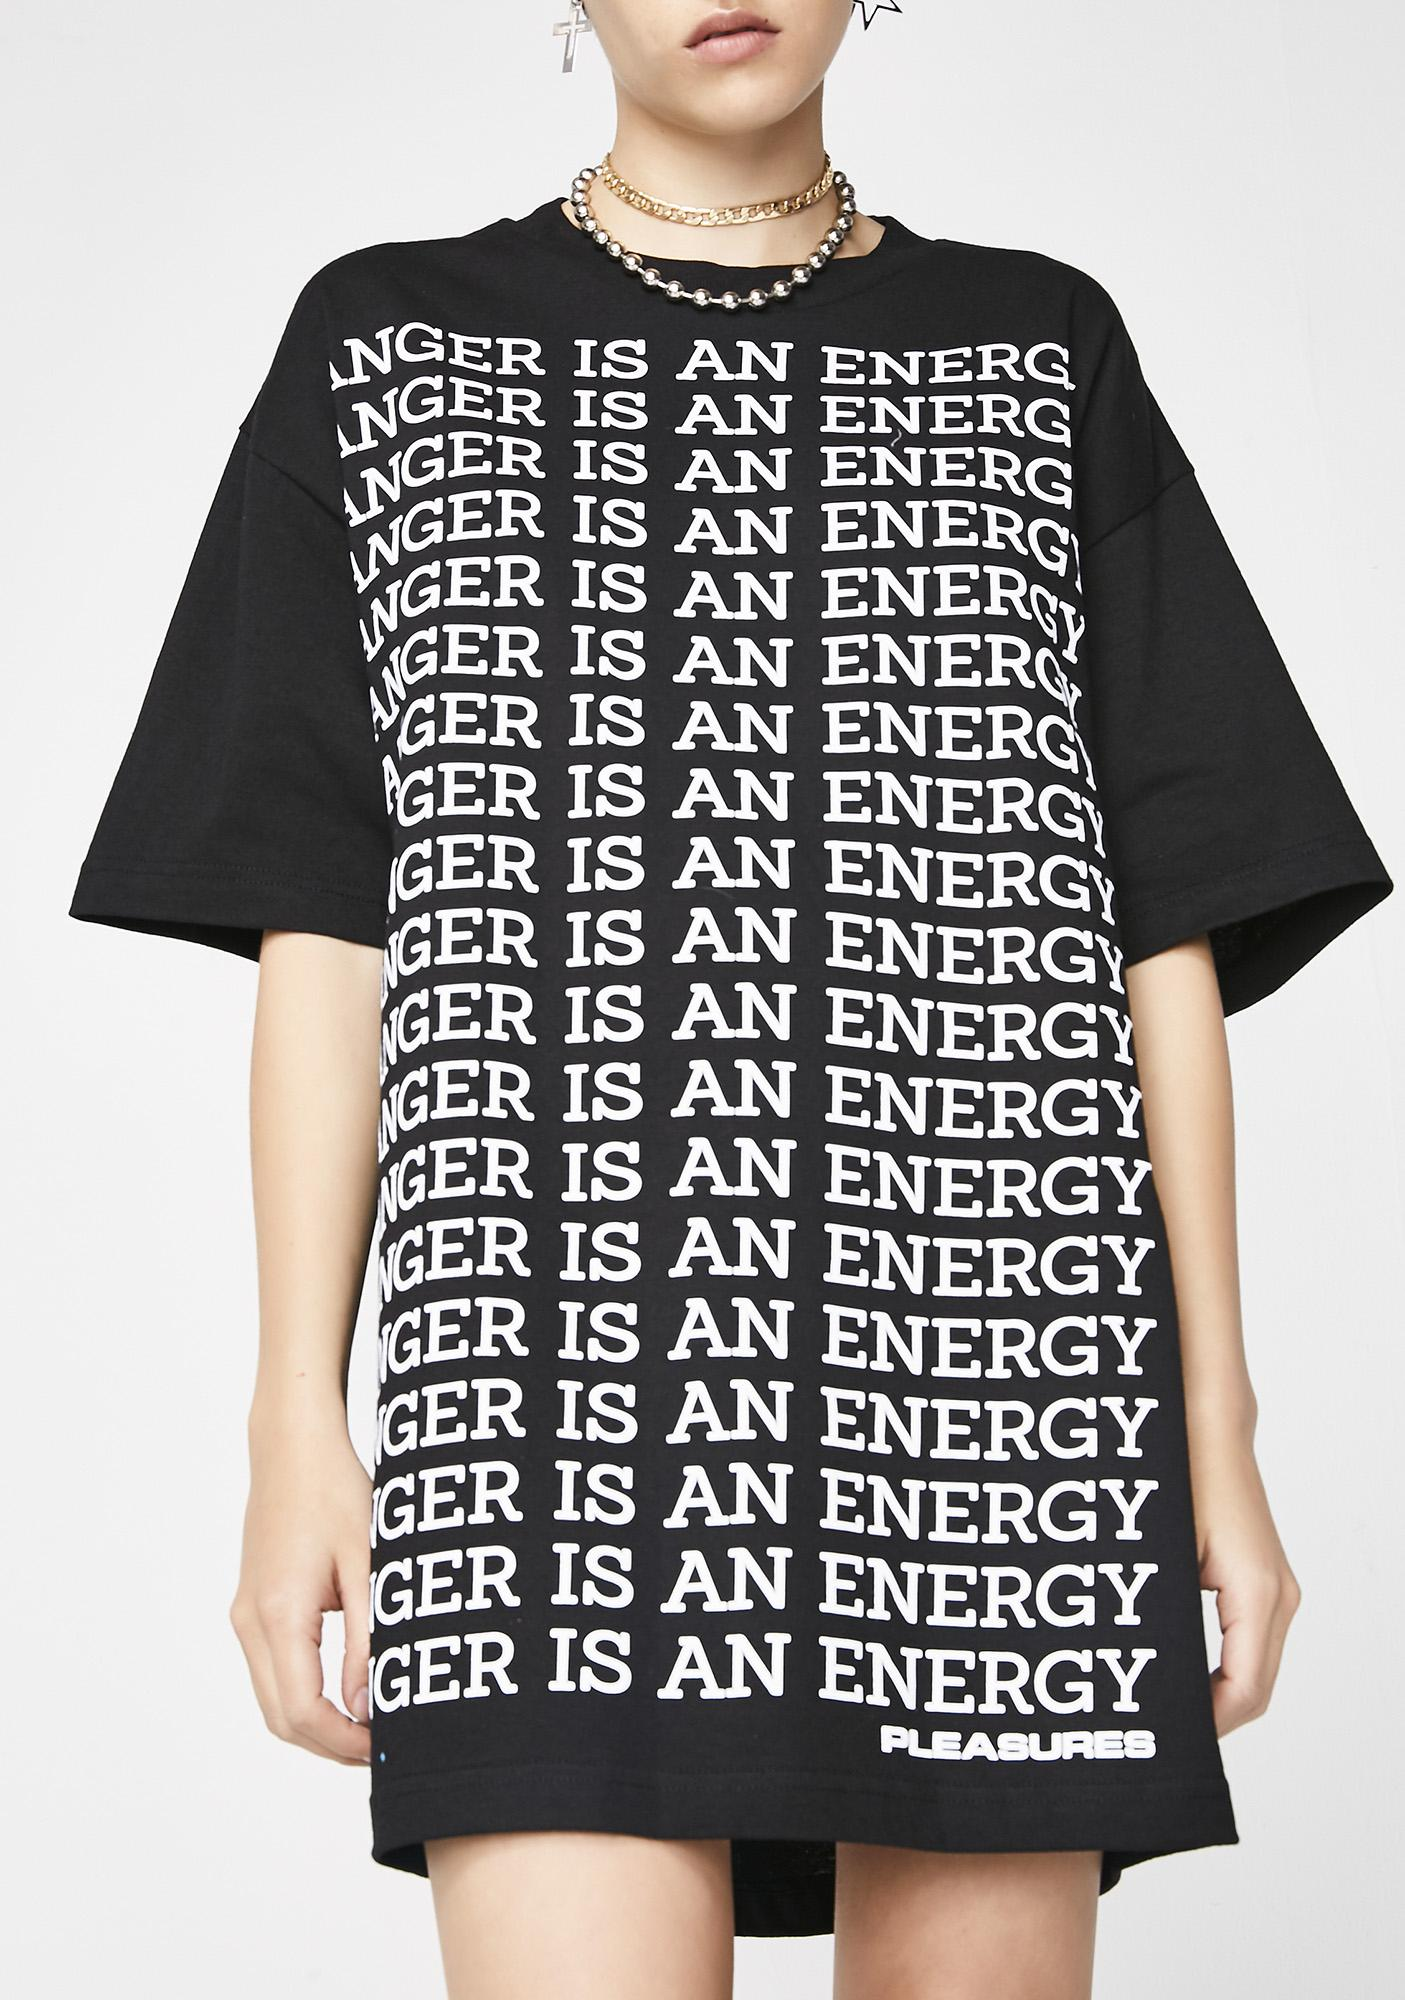 Pleasures Anger T Shirt